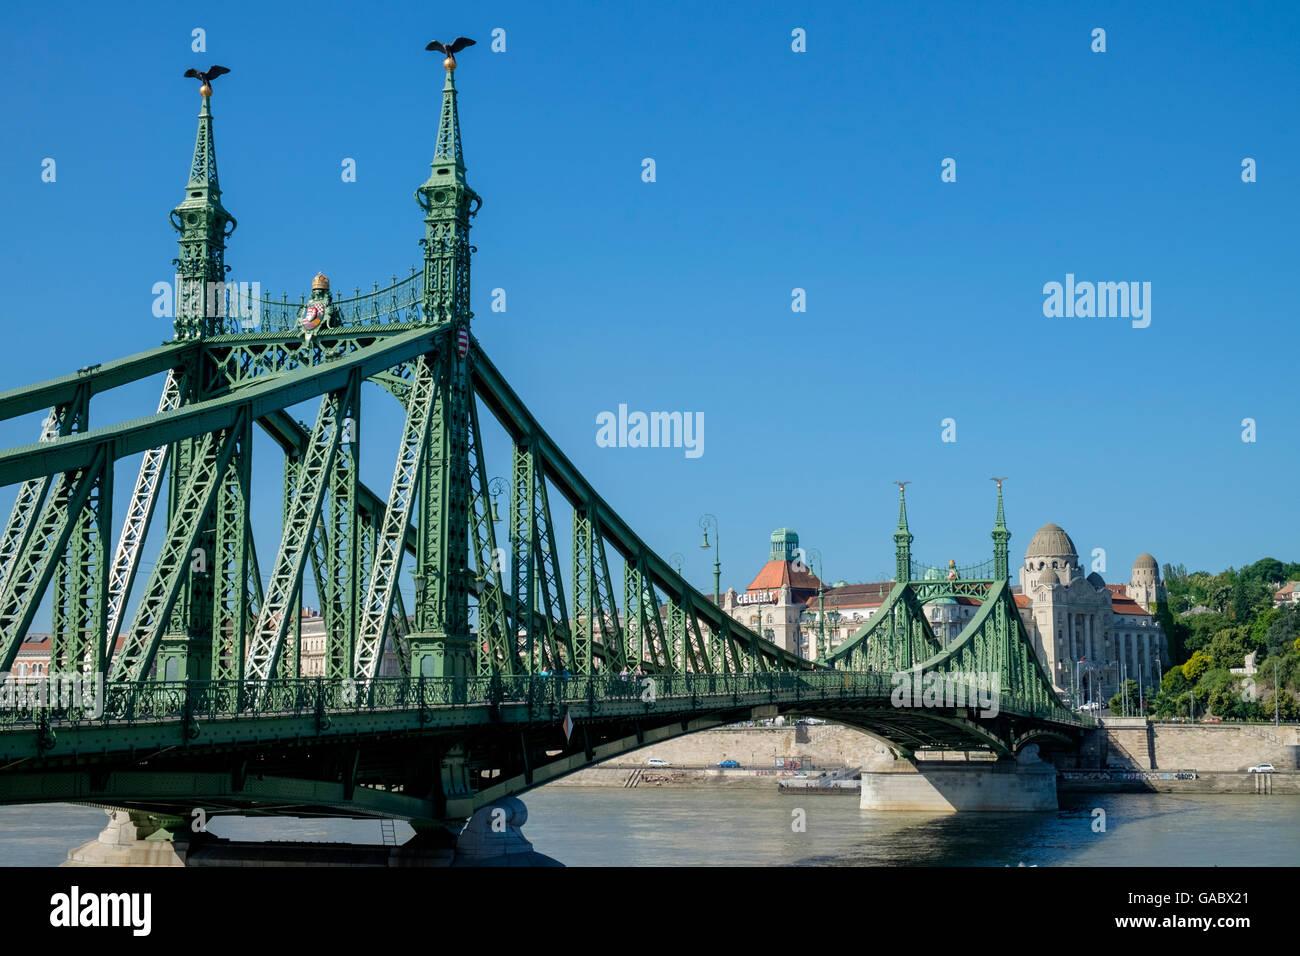 Liberty Bridge (aka Freedom Bridge), a cantilever truss bridge, connecting Buda and Pest, central Budapest, Hungary - Stock Image